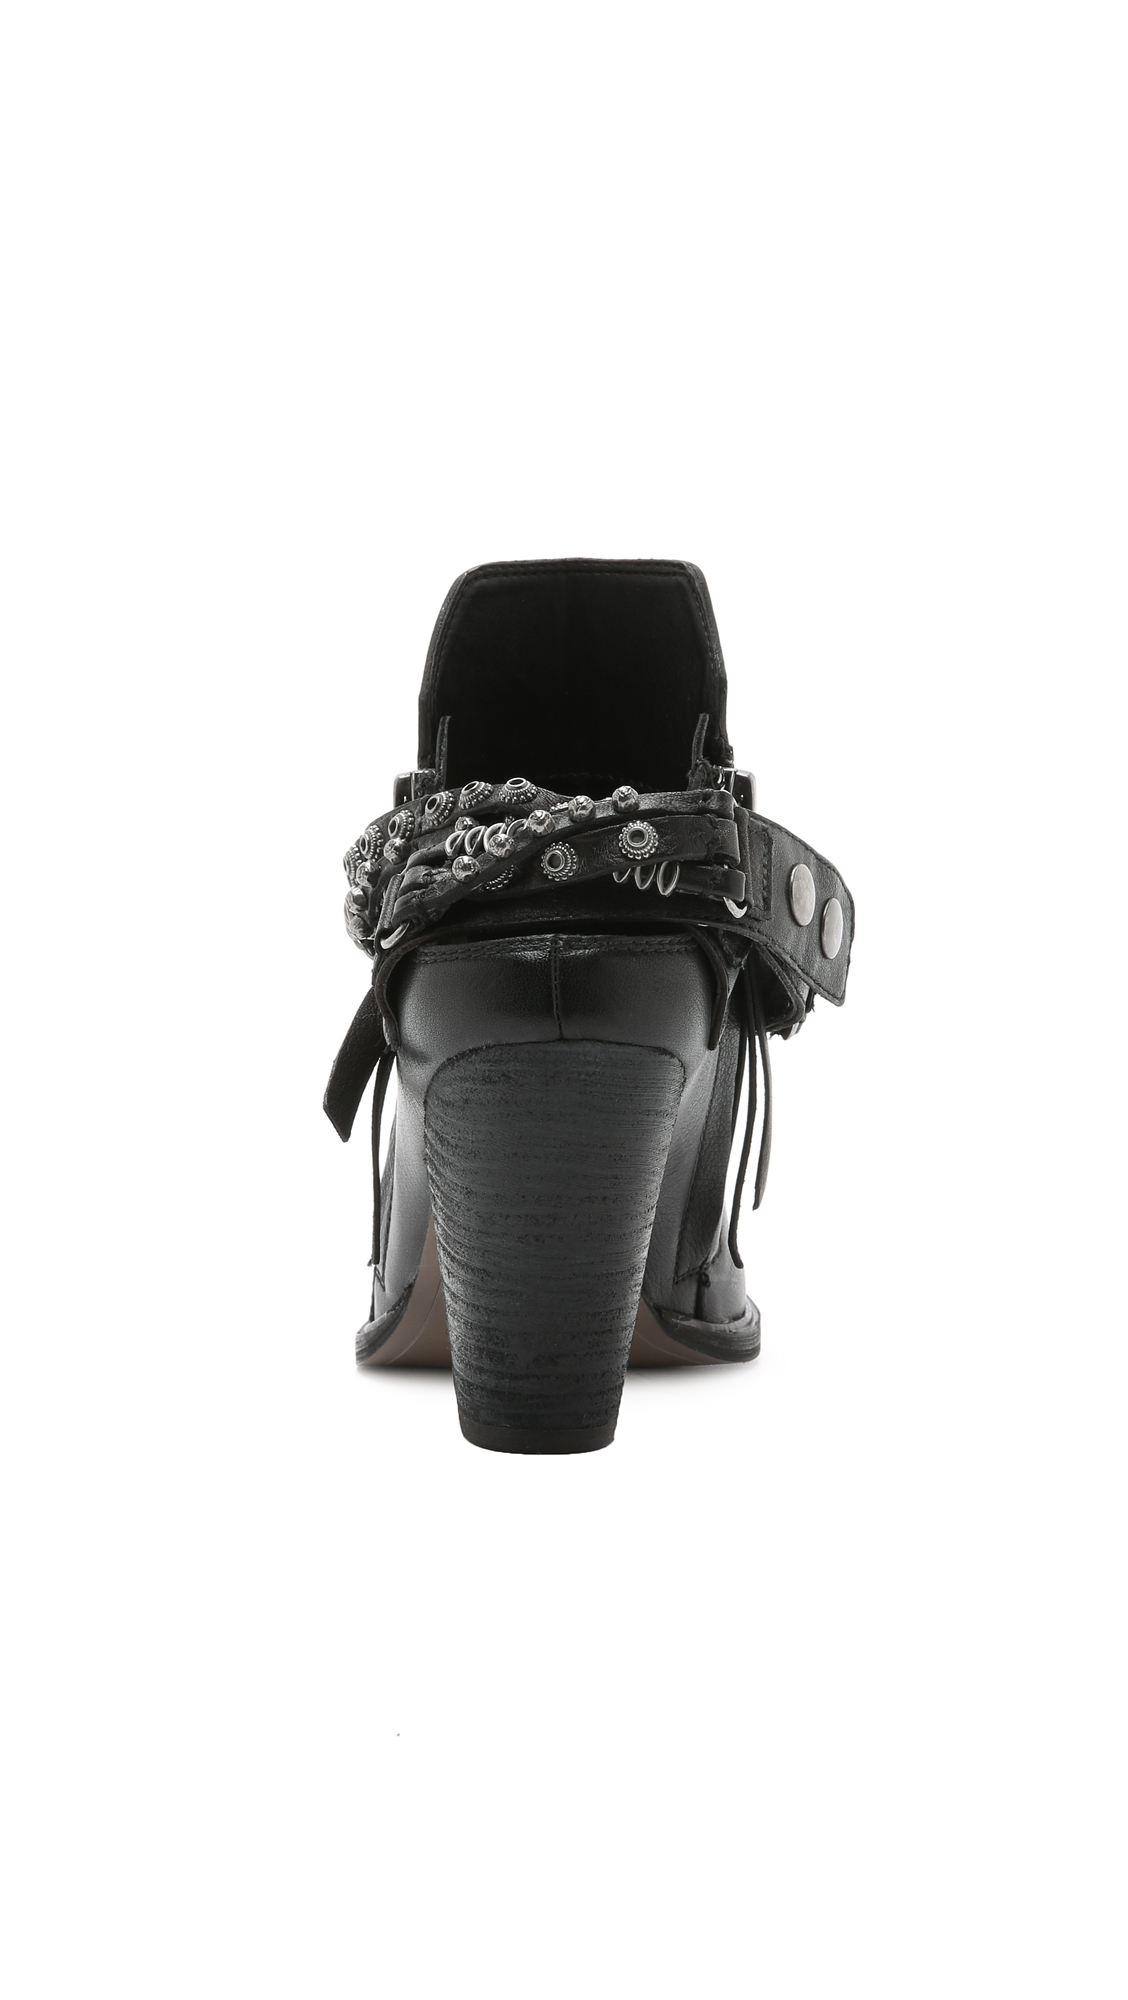 Dolce Vita Hollice Studded Booties - Black